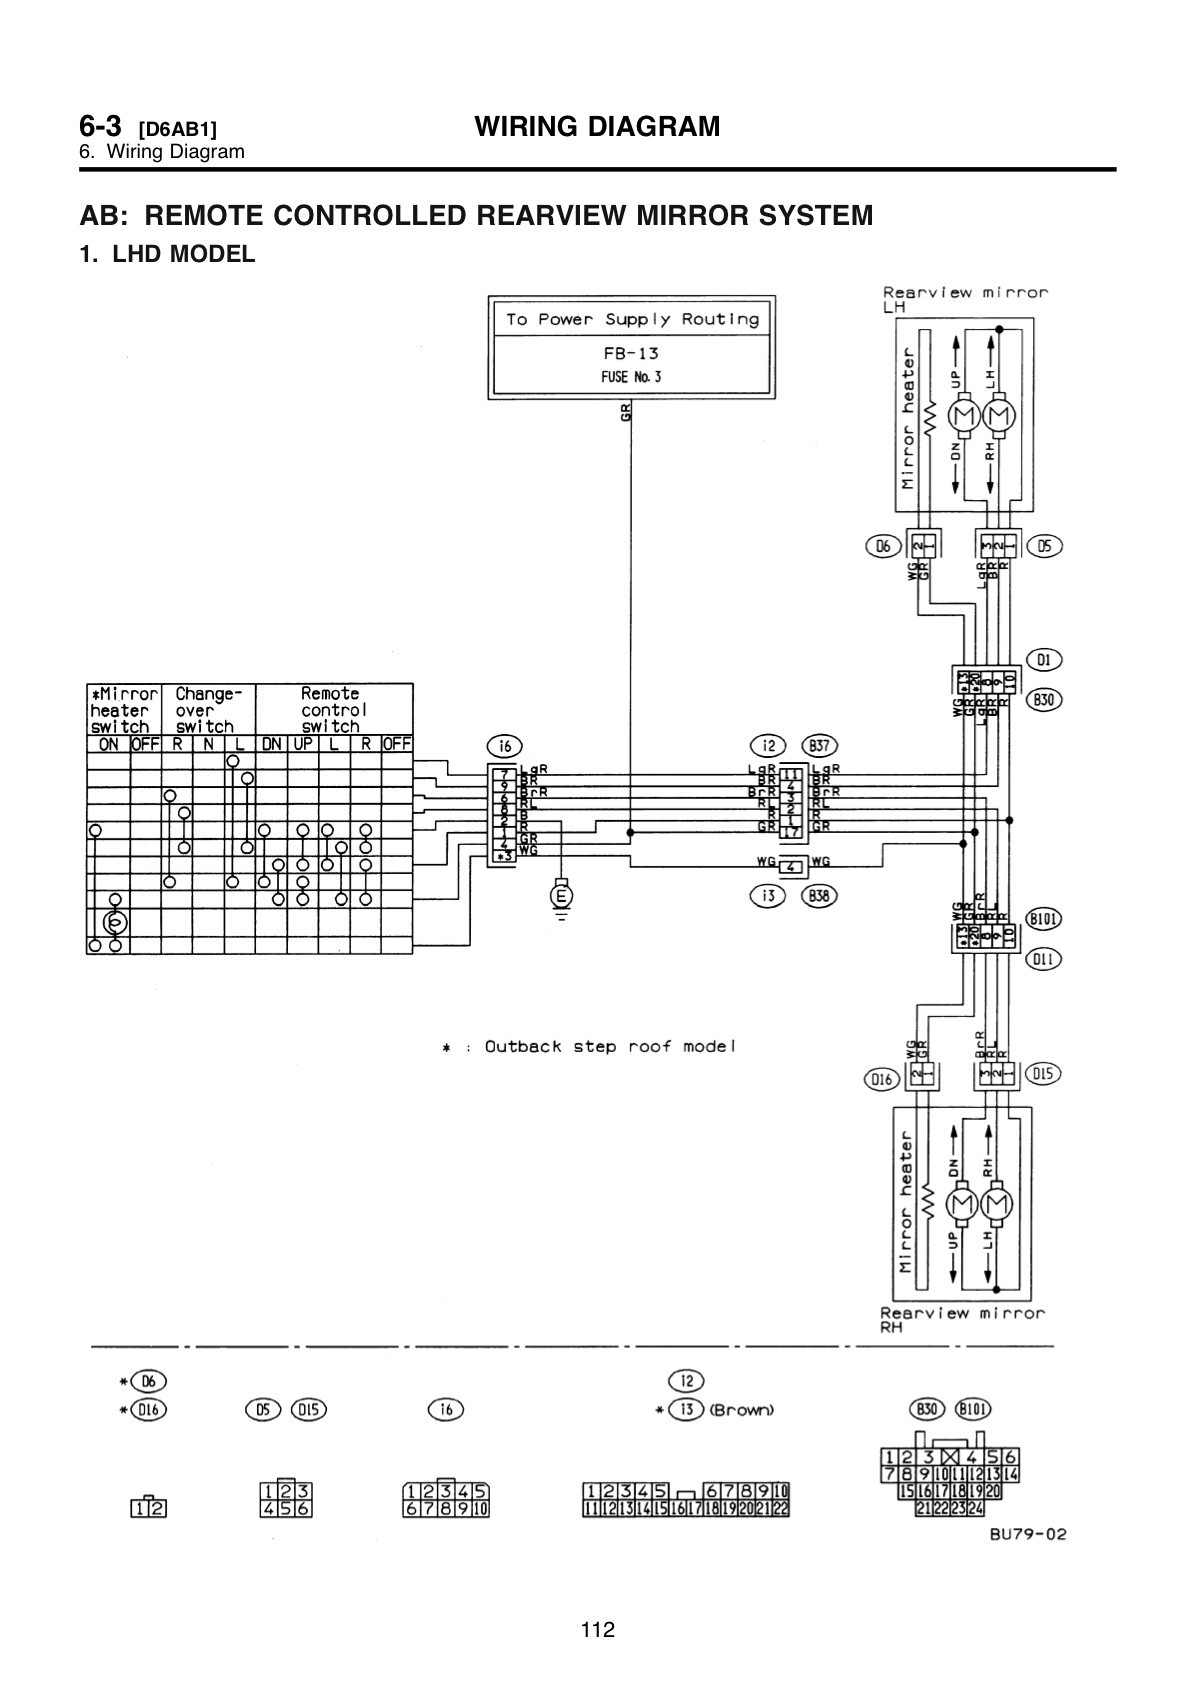 Gntx 313 10 Pin Wiring Diagram Gentex 313 10 Pin Wiring Diagram Gentex 5 Pin Wiring Diagram Of Gntx 313 10 Pin Wiring Diagram